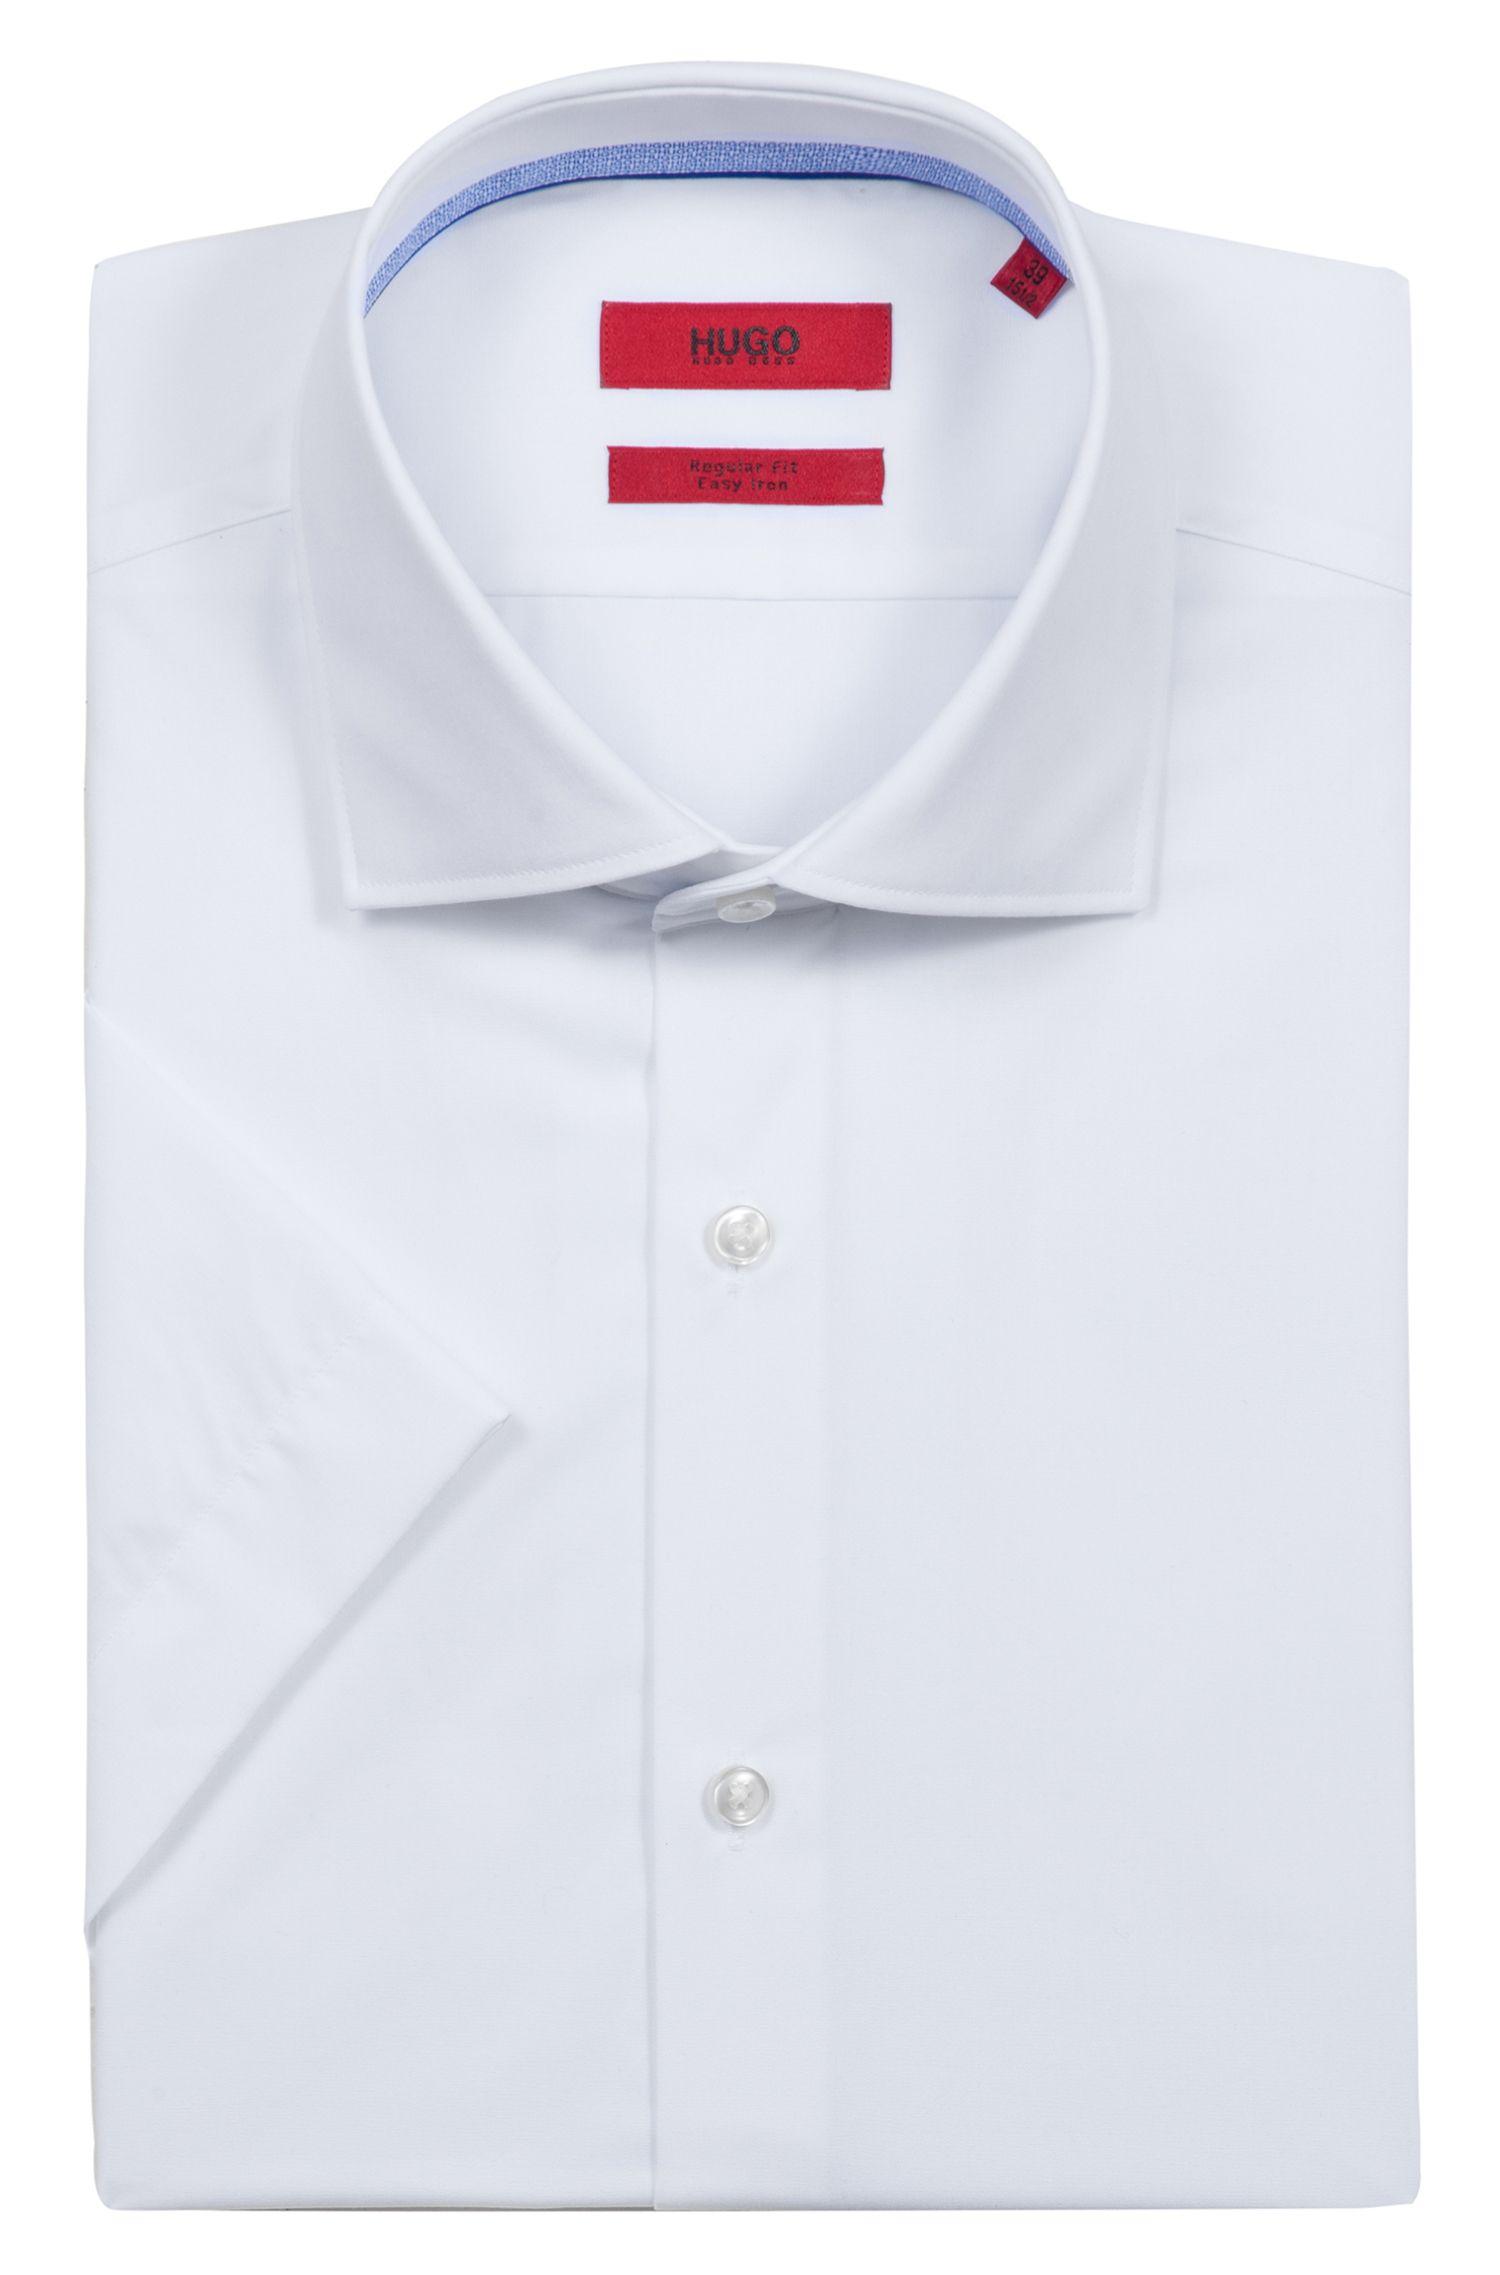 Hugo Boss - Regular-Fit Kurzarm-Hemd aus Baumwoll-Popeline mit Cutaway-Kragen - 5